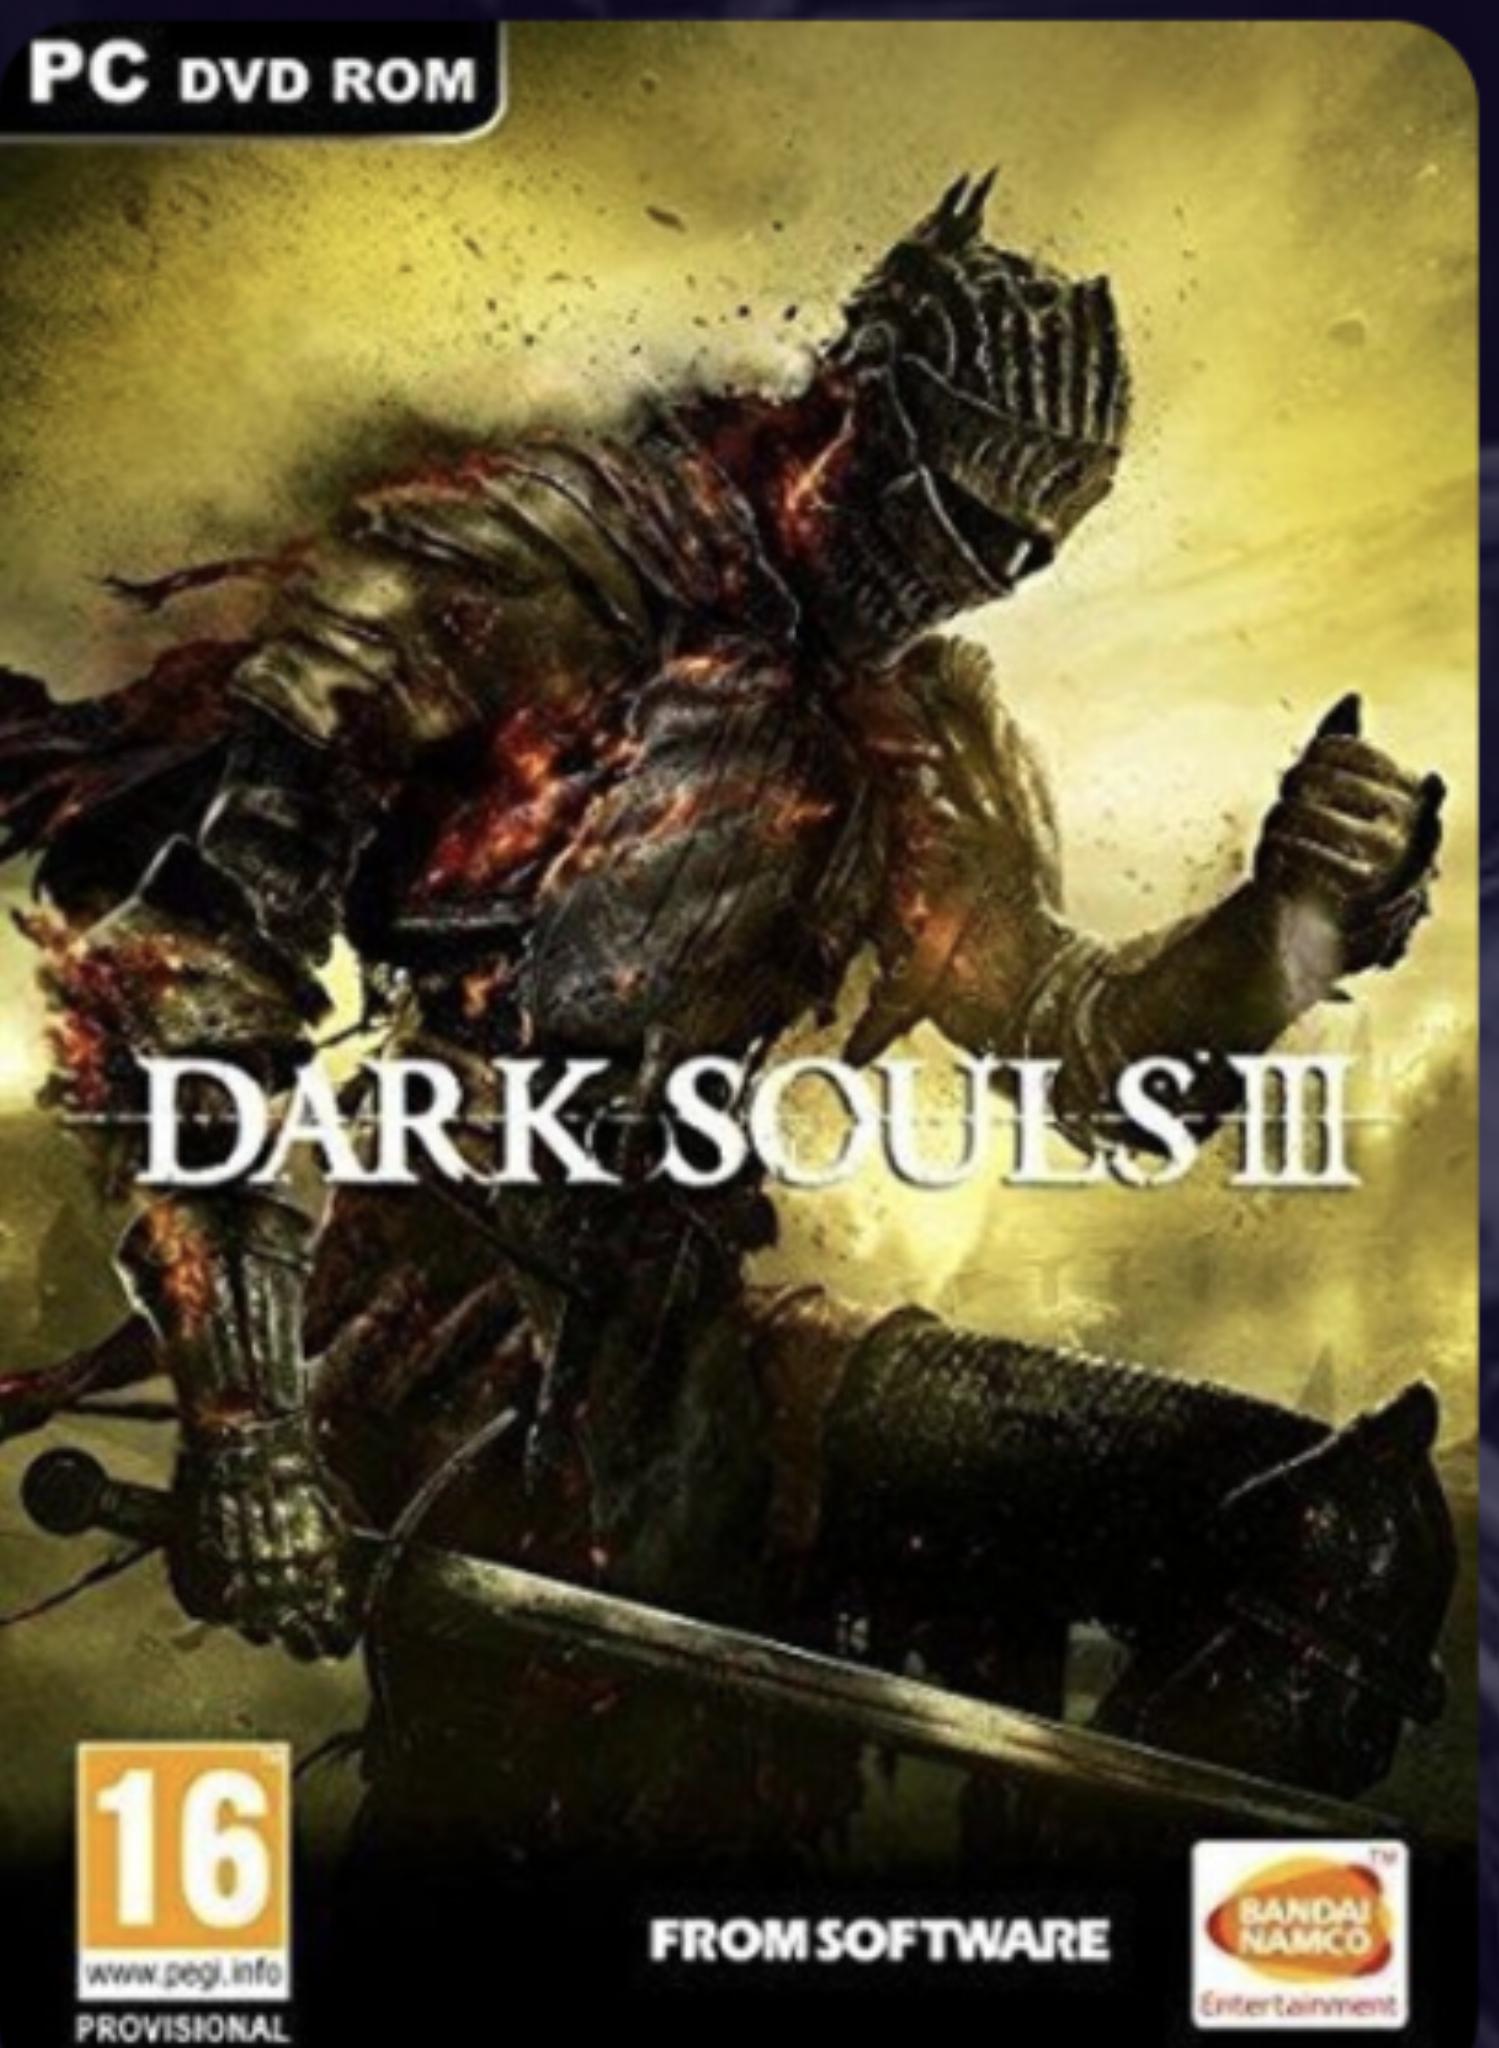 Dark Souls 3 Standard Edition / Deluxe Edition (PC - Steam) - £6.99 / £9.99 @ CDKeys